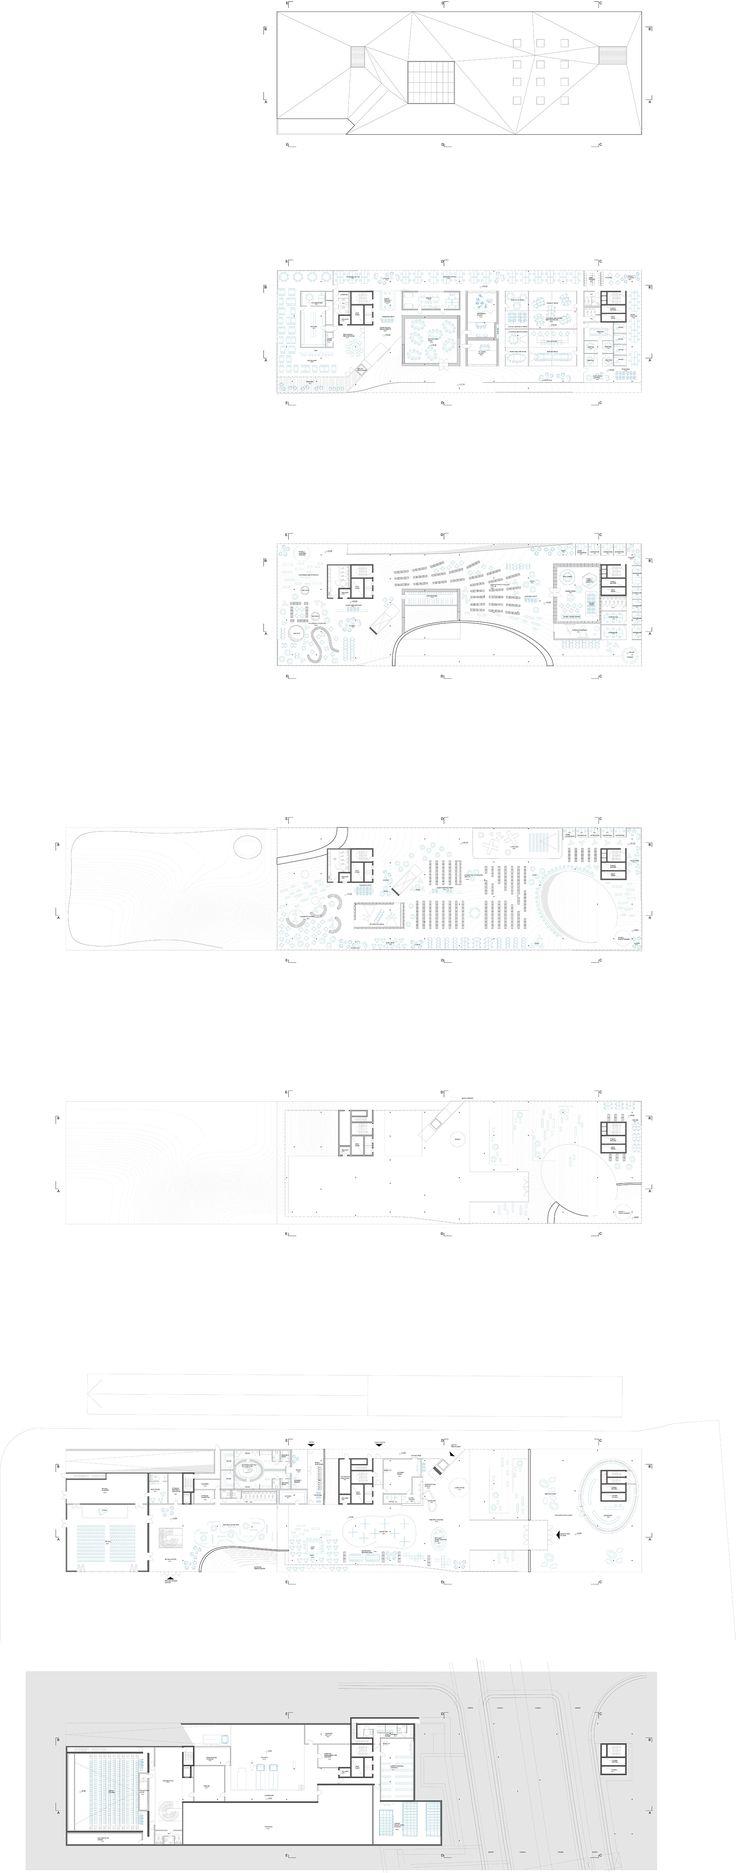 Helsinki Library - Plans